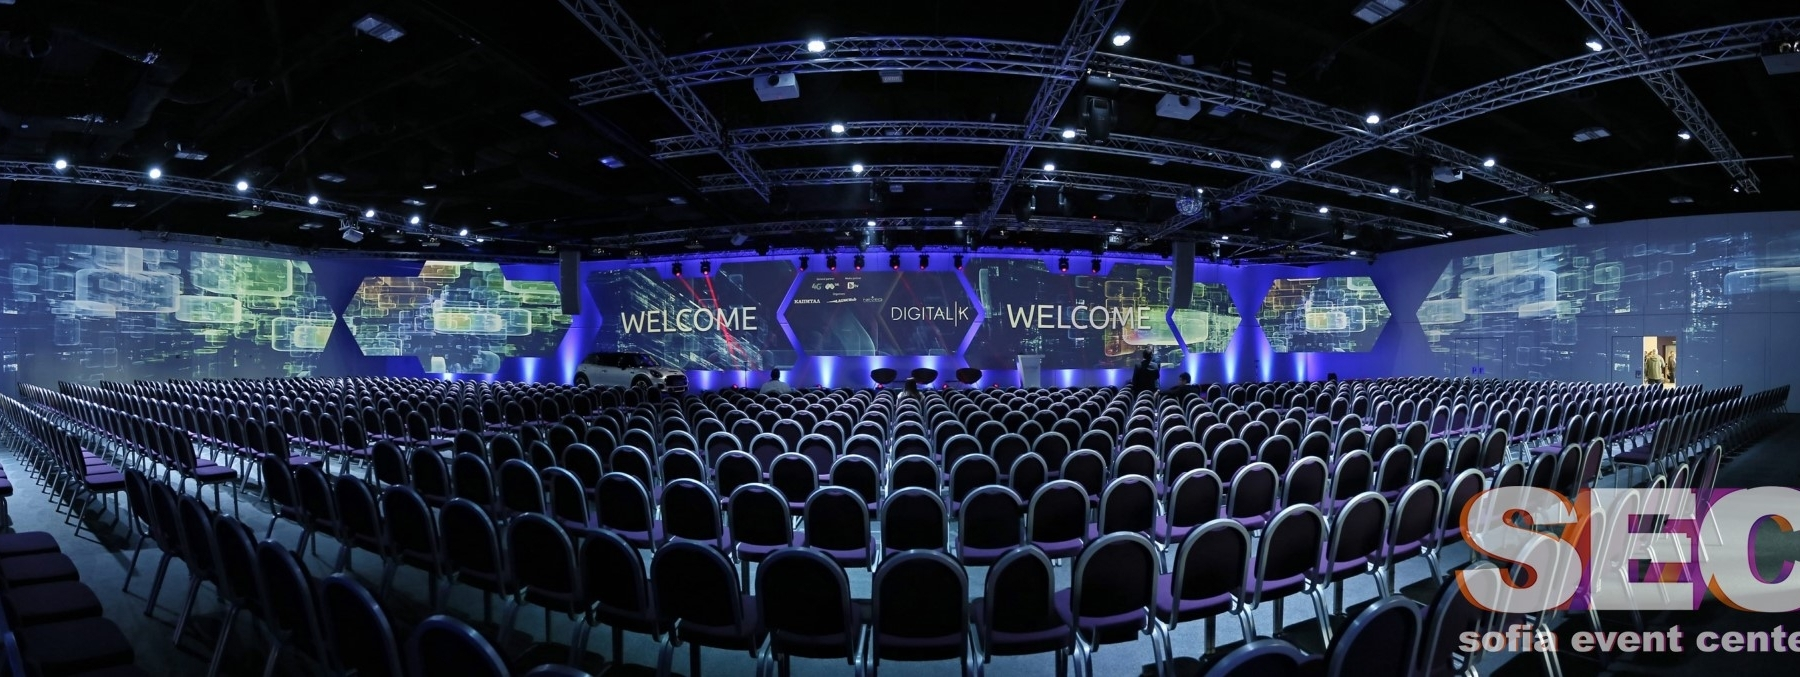 Конференции, семинари, конгреси